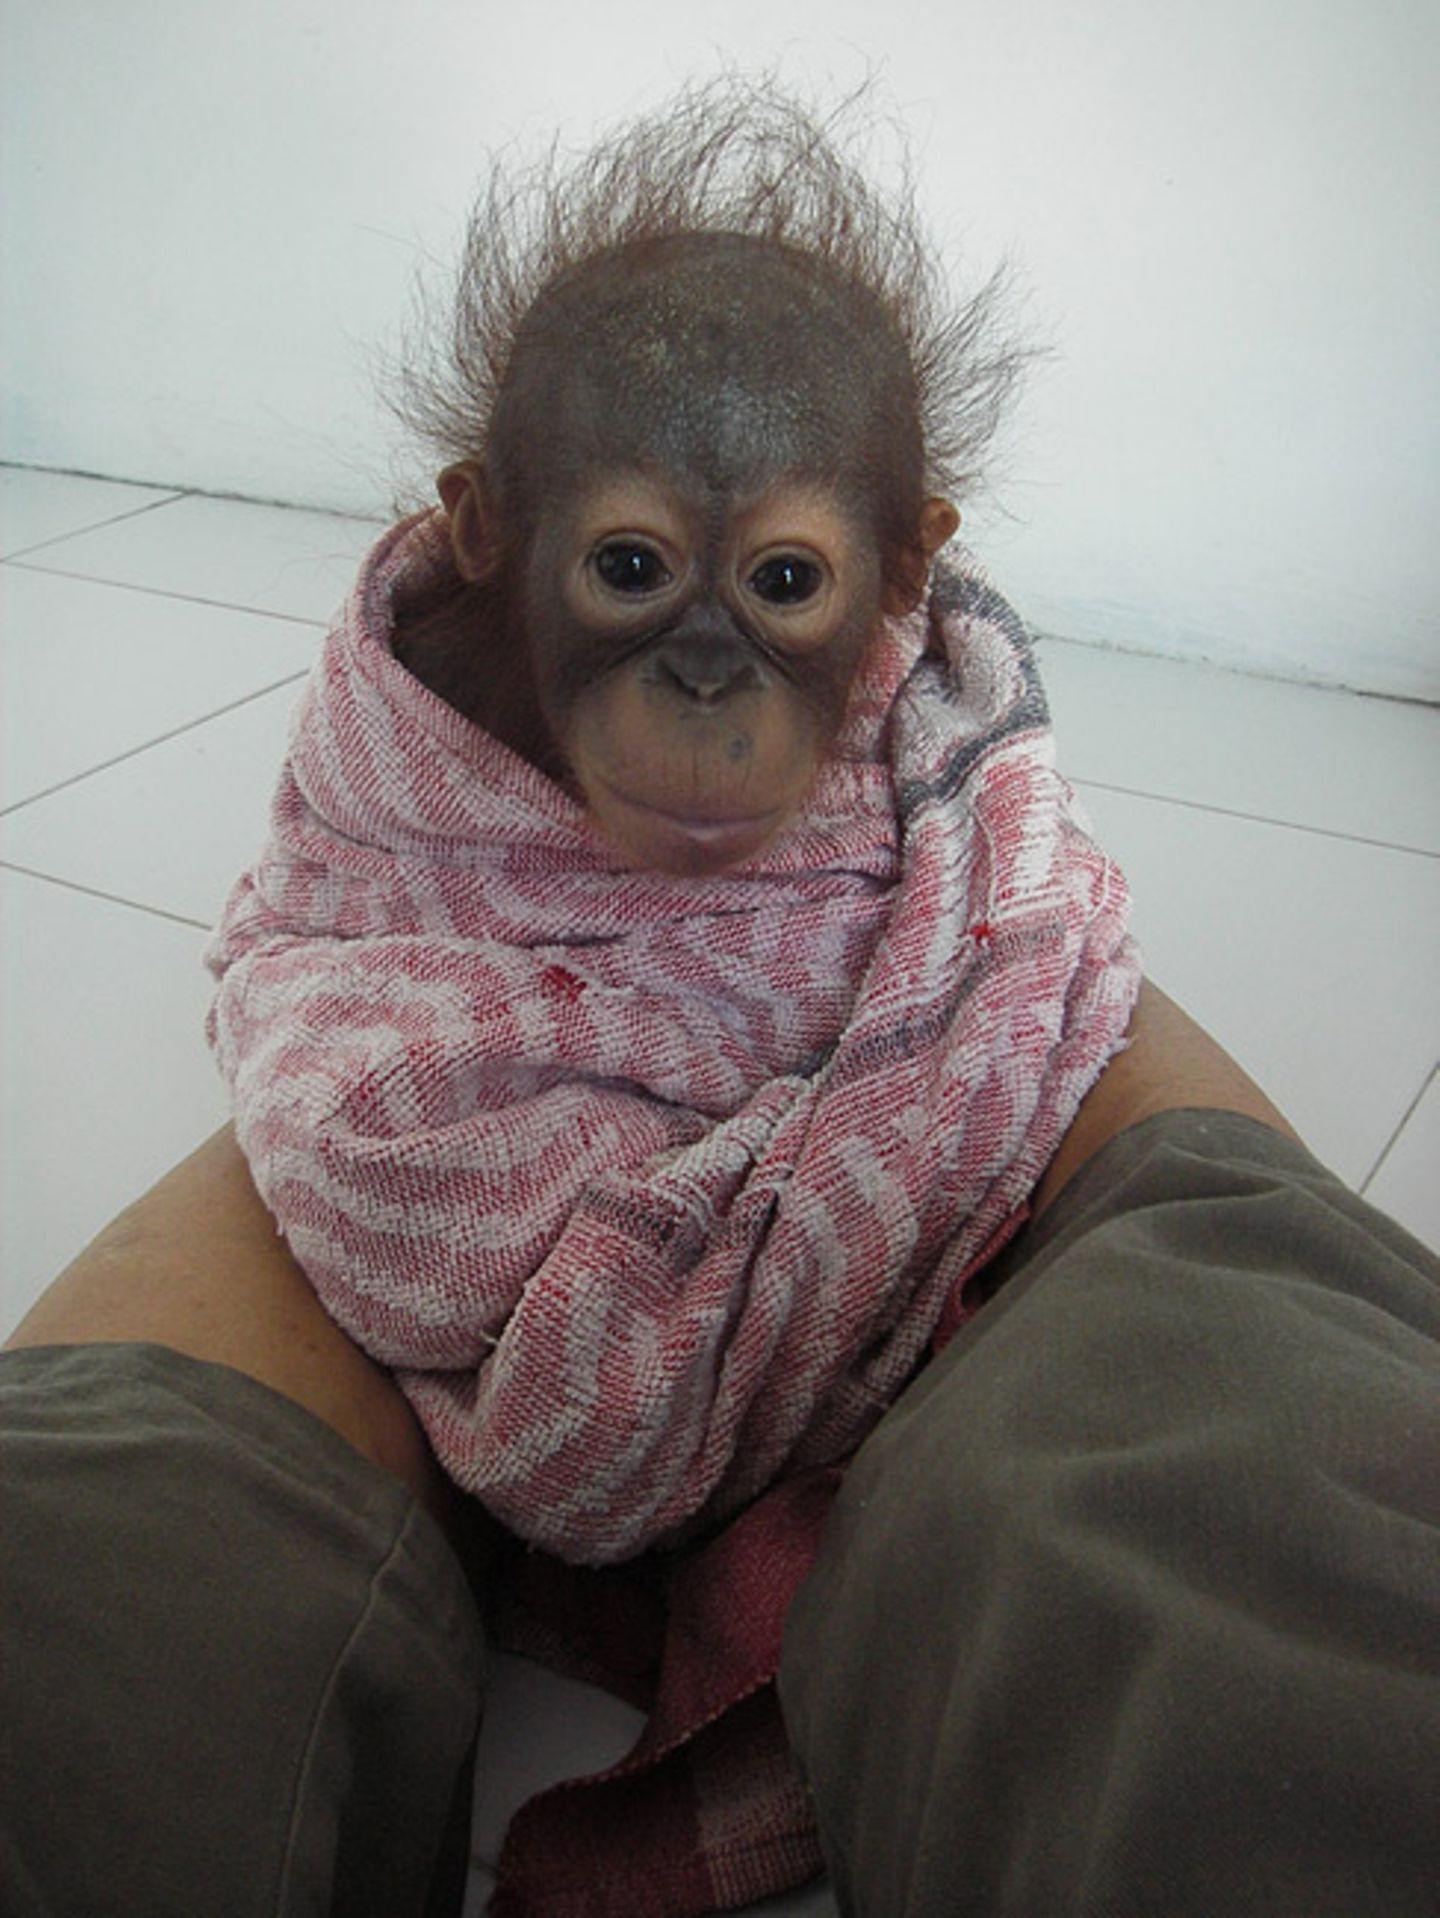 Menschenaffen: Orang-Utans in Not - Bild 6